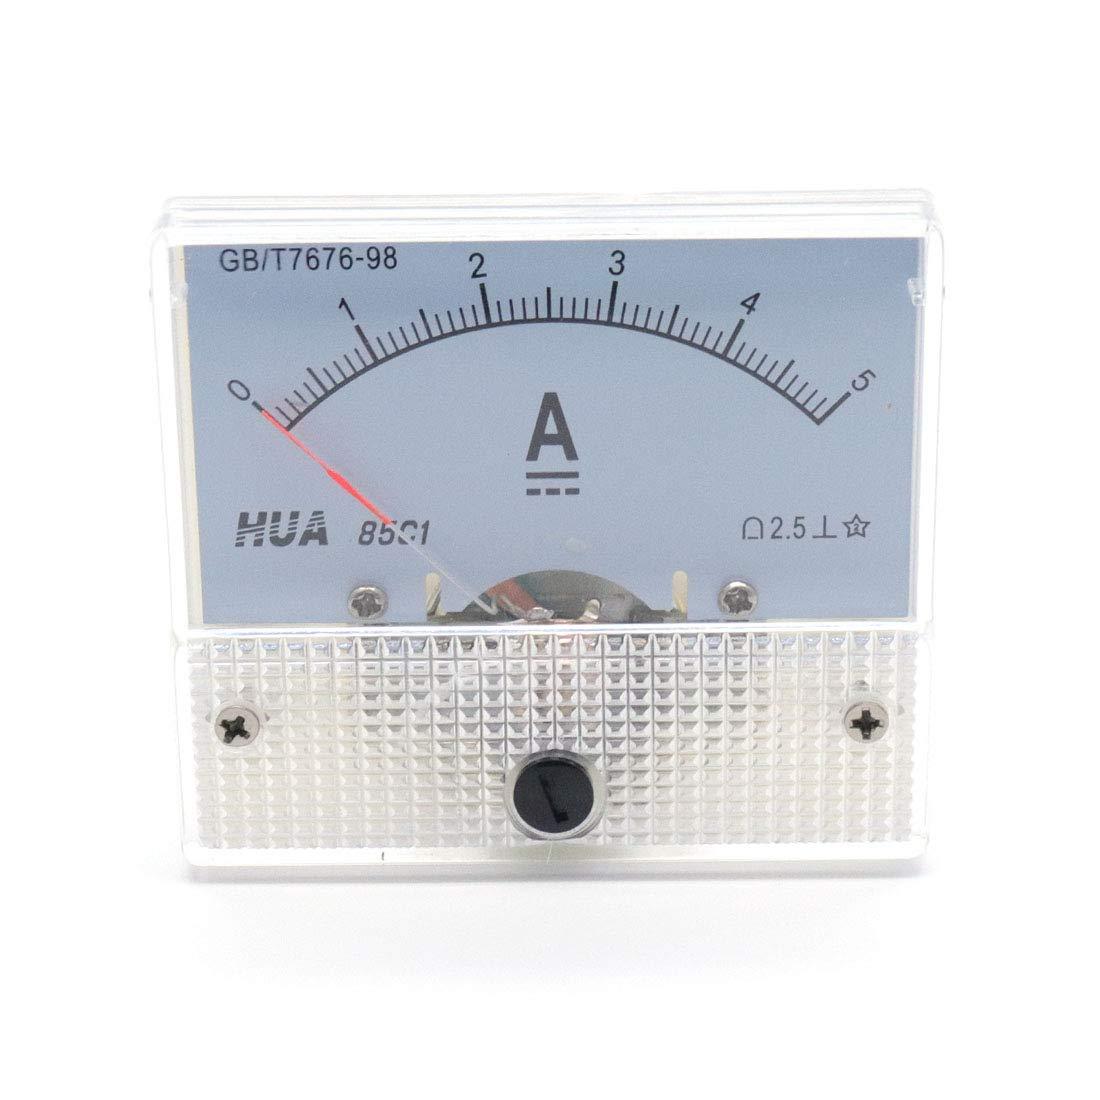 Aodesy Analog 85C1 AC 0-5A Rectangle Analog Panel Ammeter Gauge Shenzhenshiaodesiwujinjidianyouxiangongsi